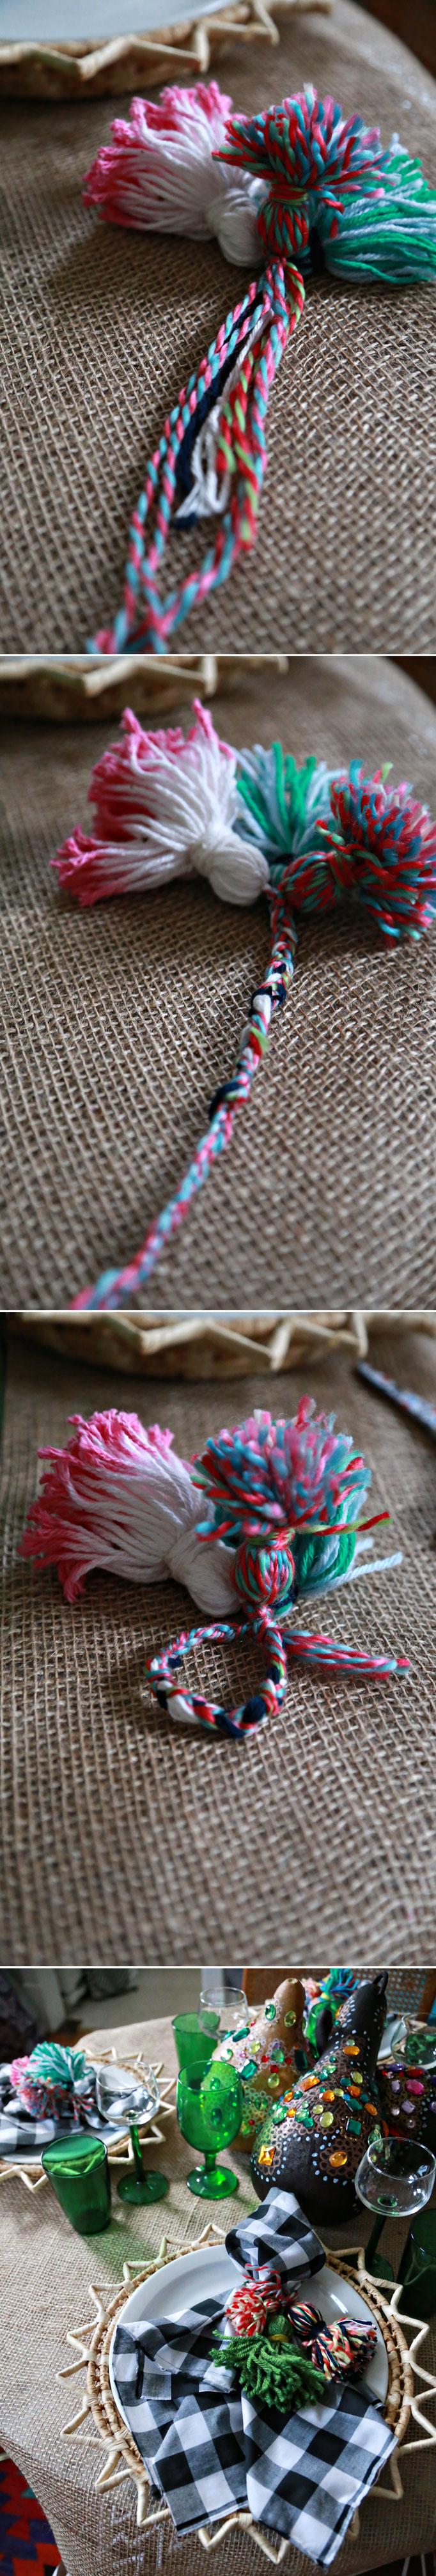 yarn-tassel-napkin-rings-682